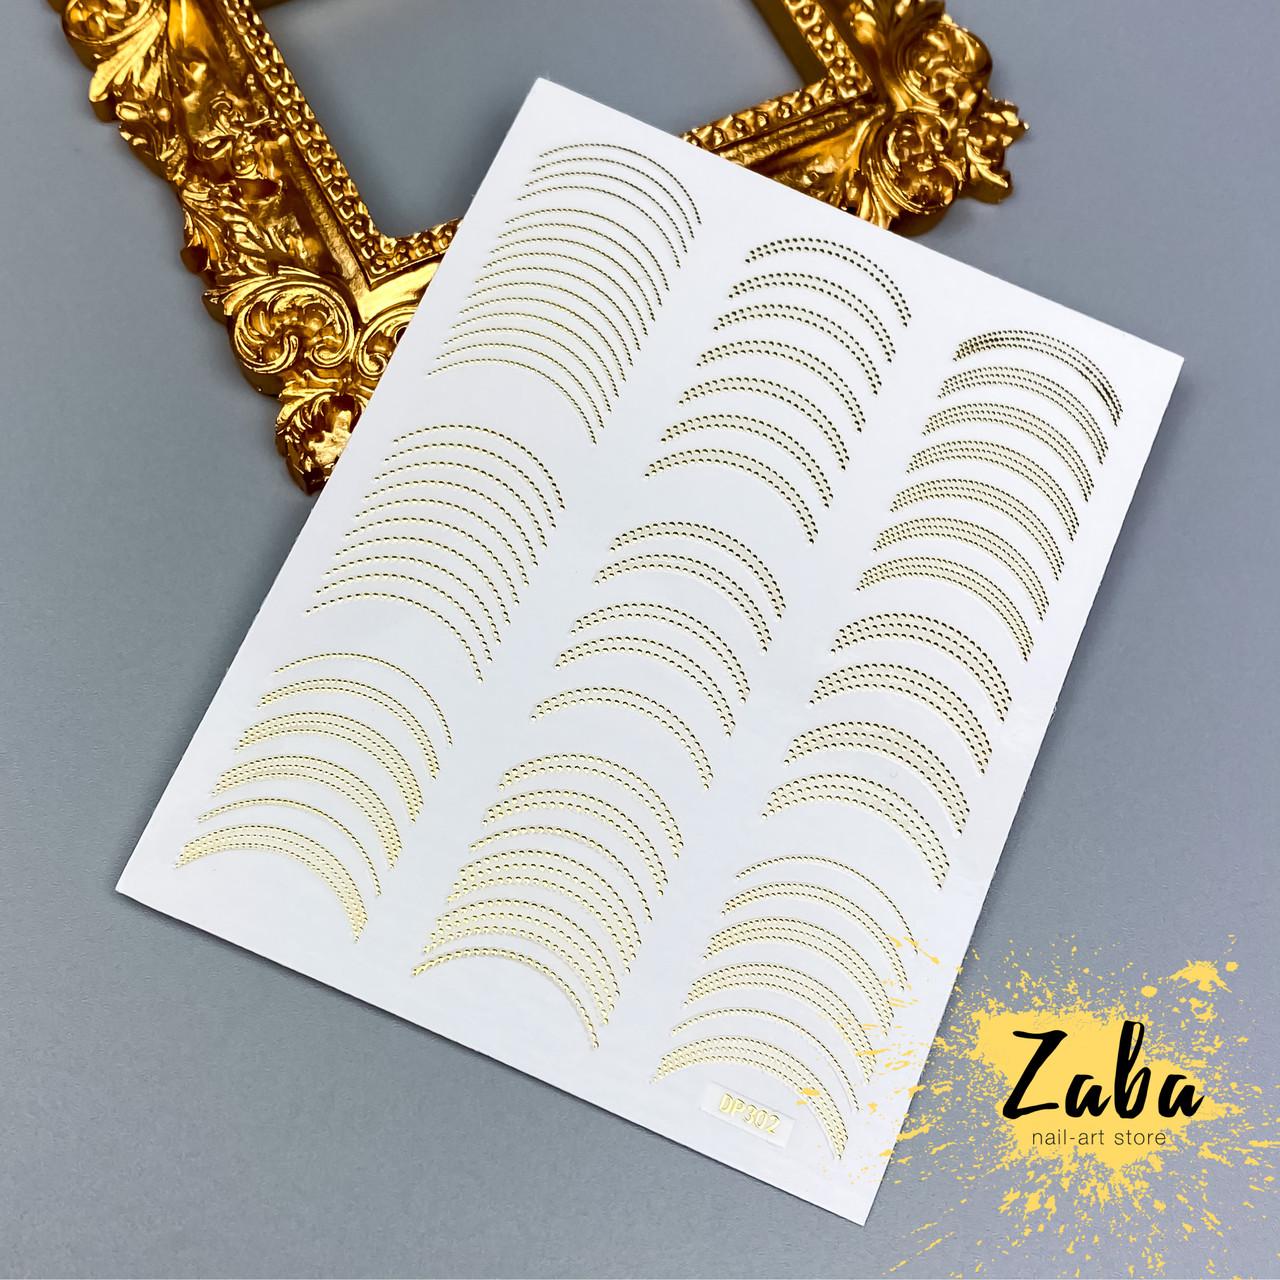 3D Ленты гибкие наклейки лунки микс из точек золото